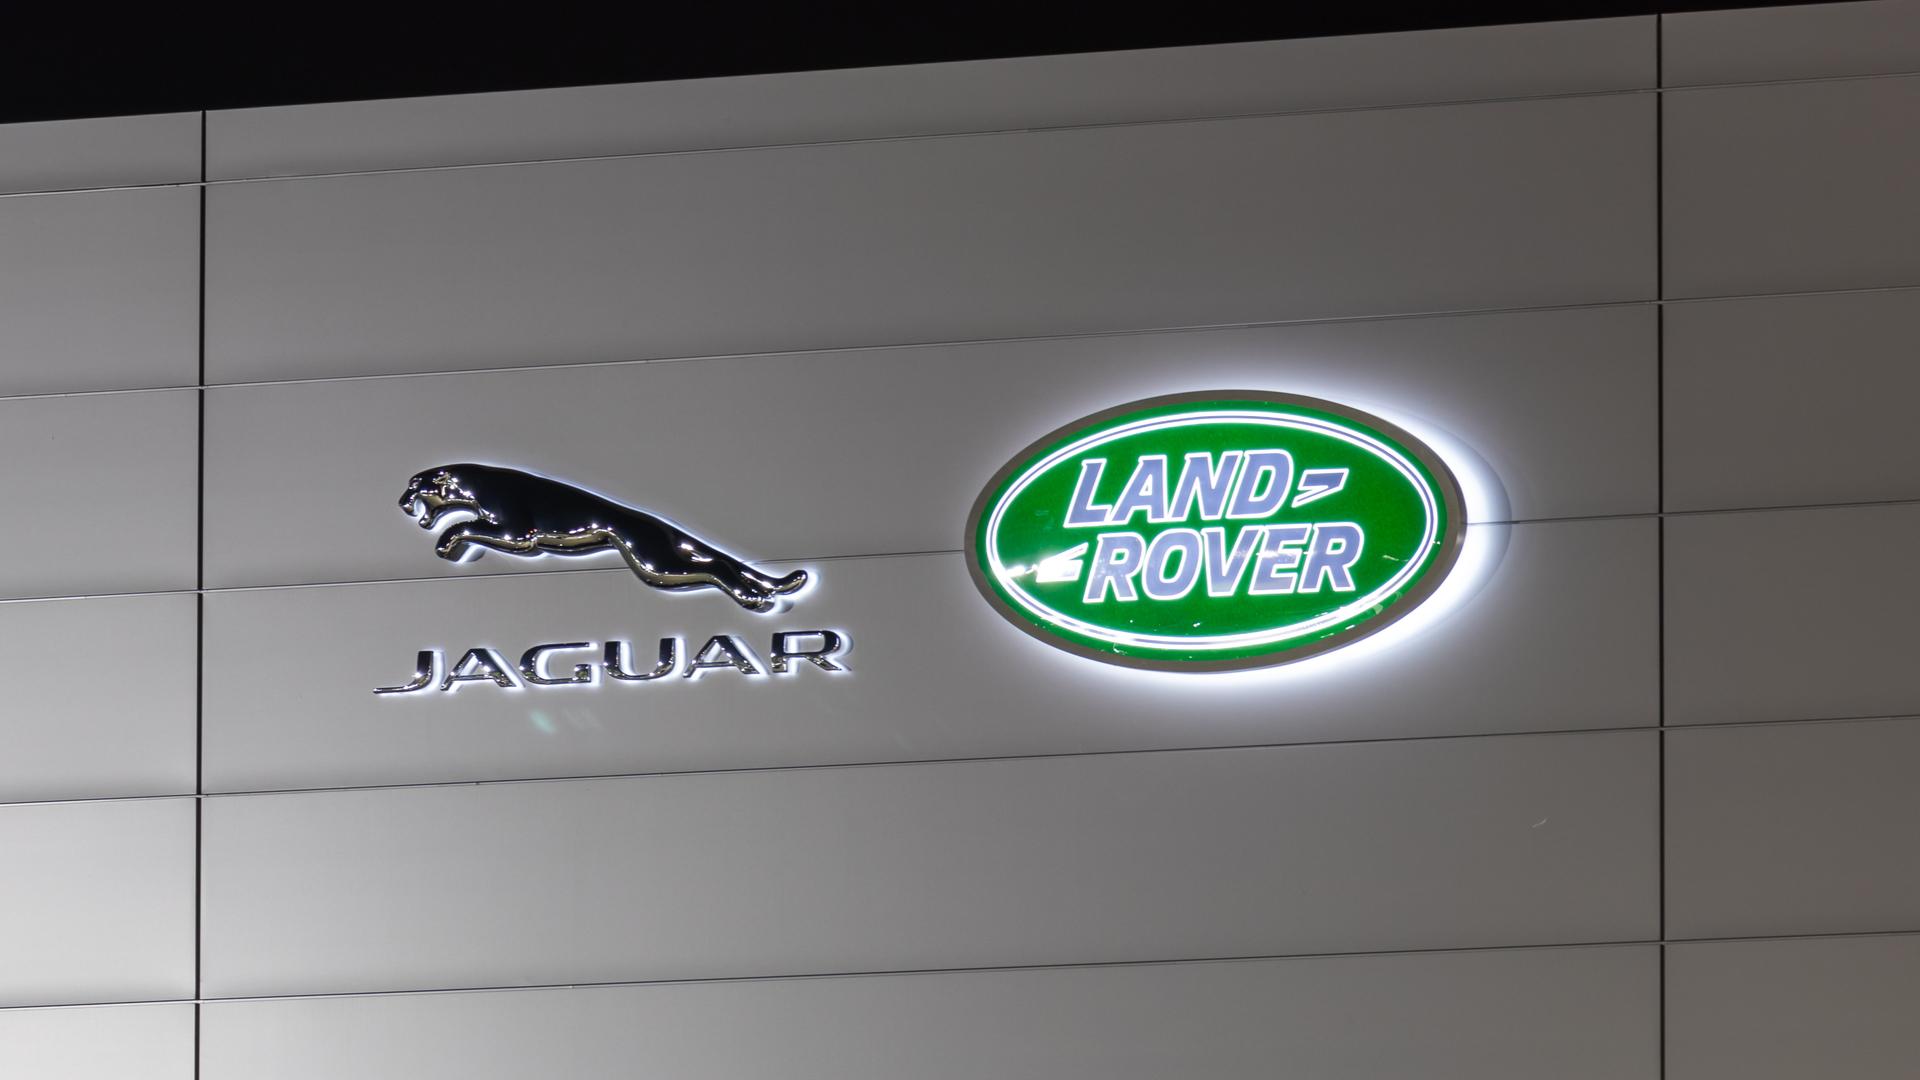 jaguar land rover marcas carro shutterstock 1494406172